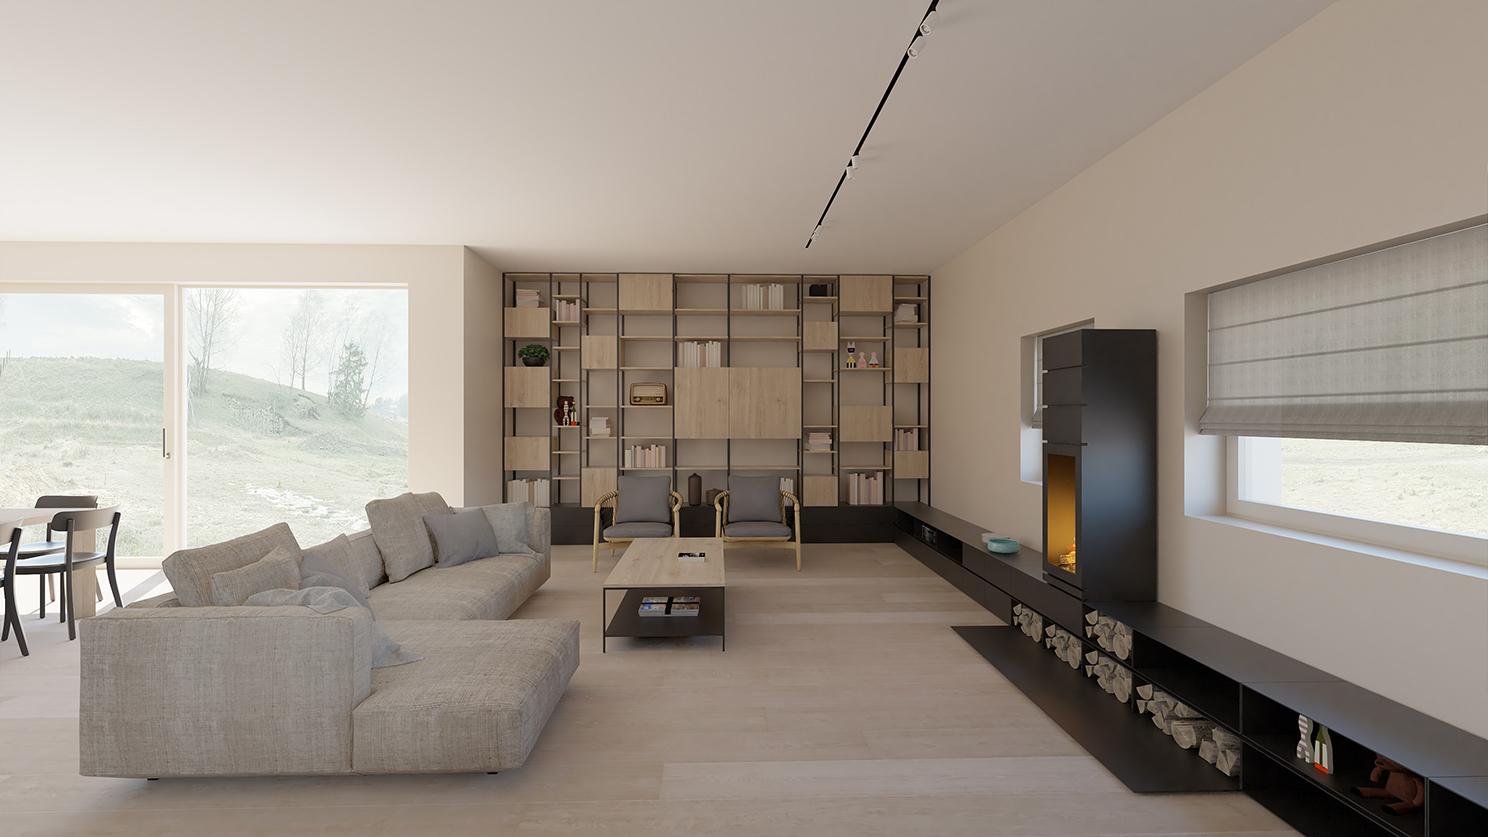 CES SVYC 01 Barbora Leblova Interiors Architecture